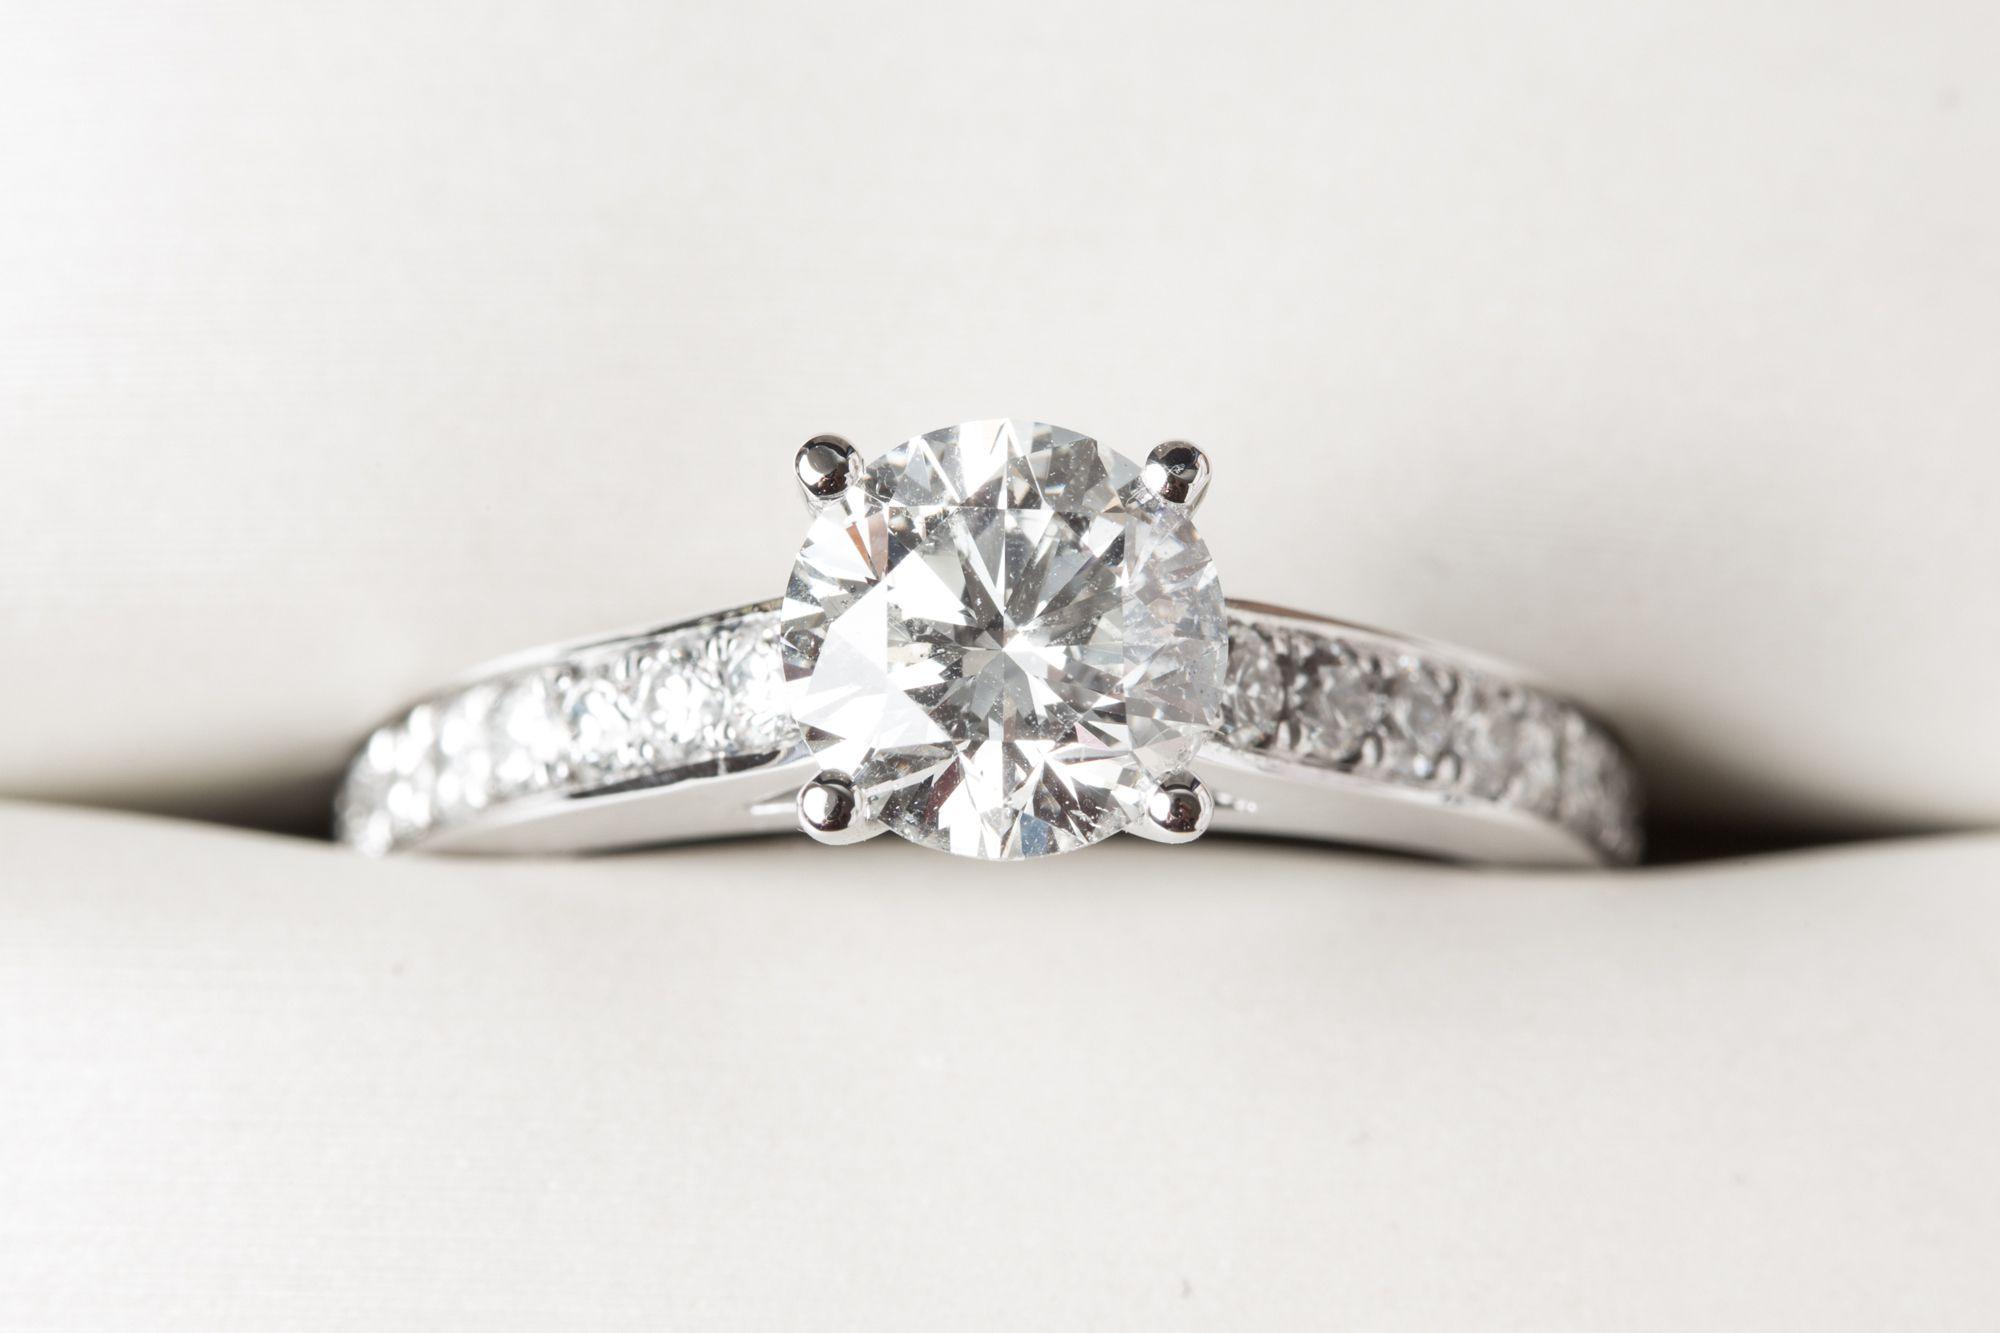 7th wedding anniversary ideas and symbols how to celebrate your 60th wedding anniversary buycottarizona